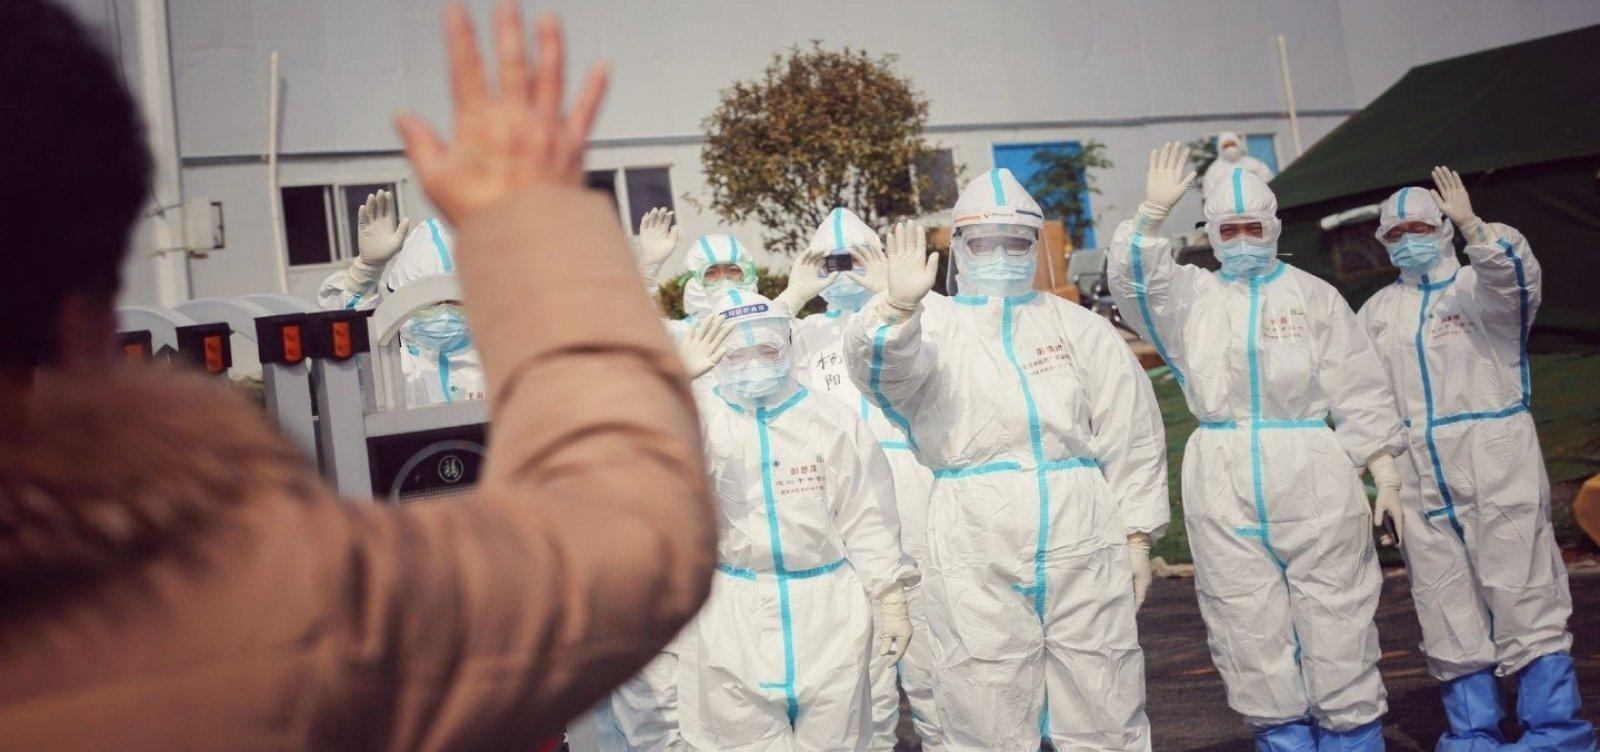 [Mundo ultrapassa marca de 4 milhões de curados do coronavírus]